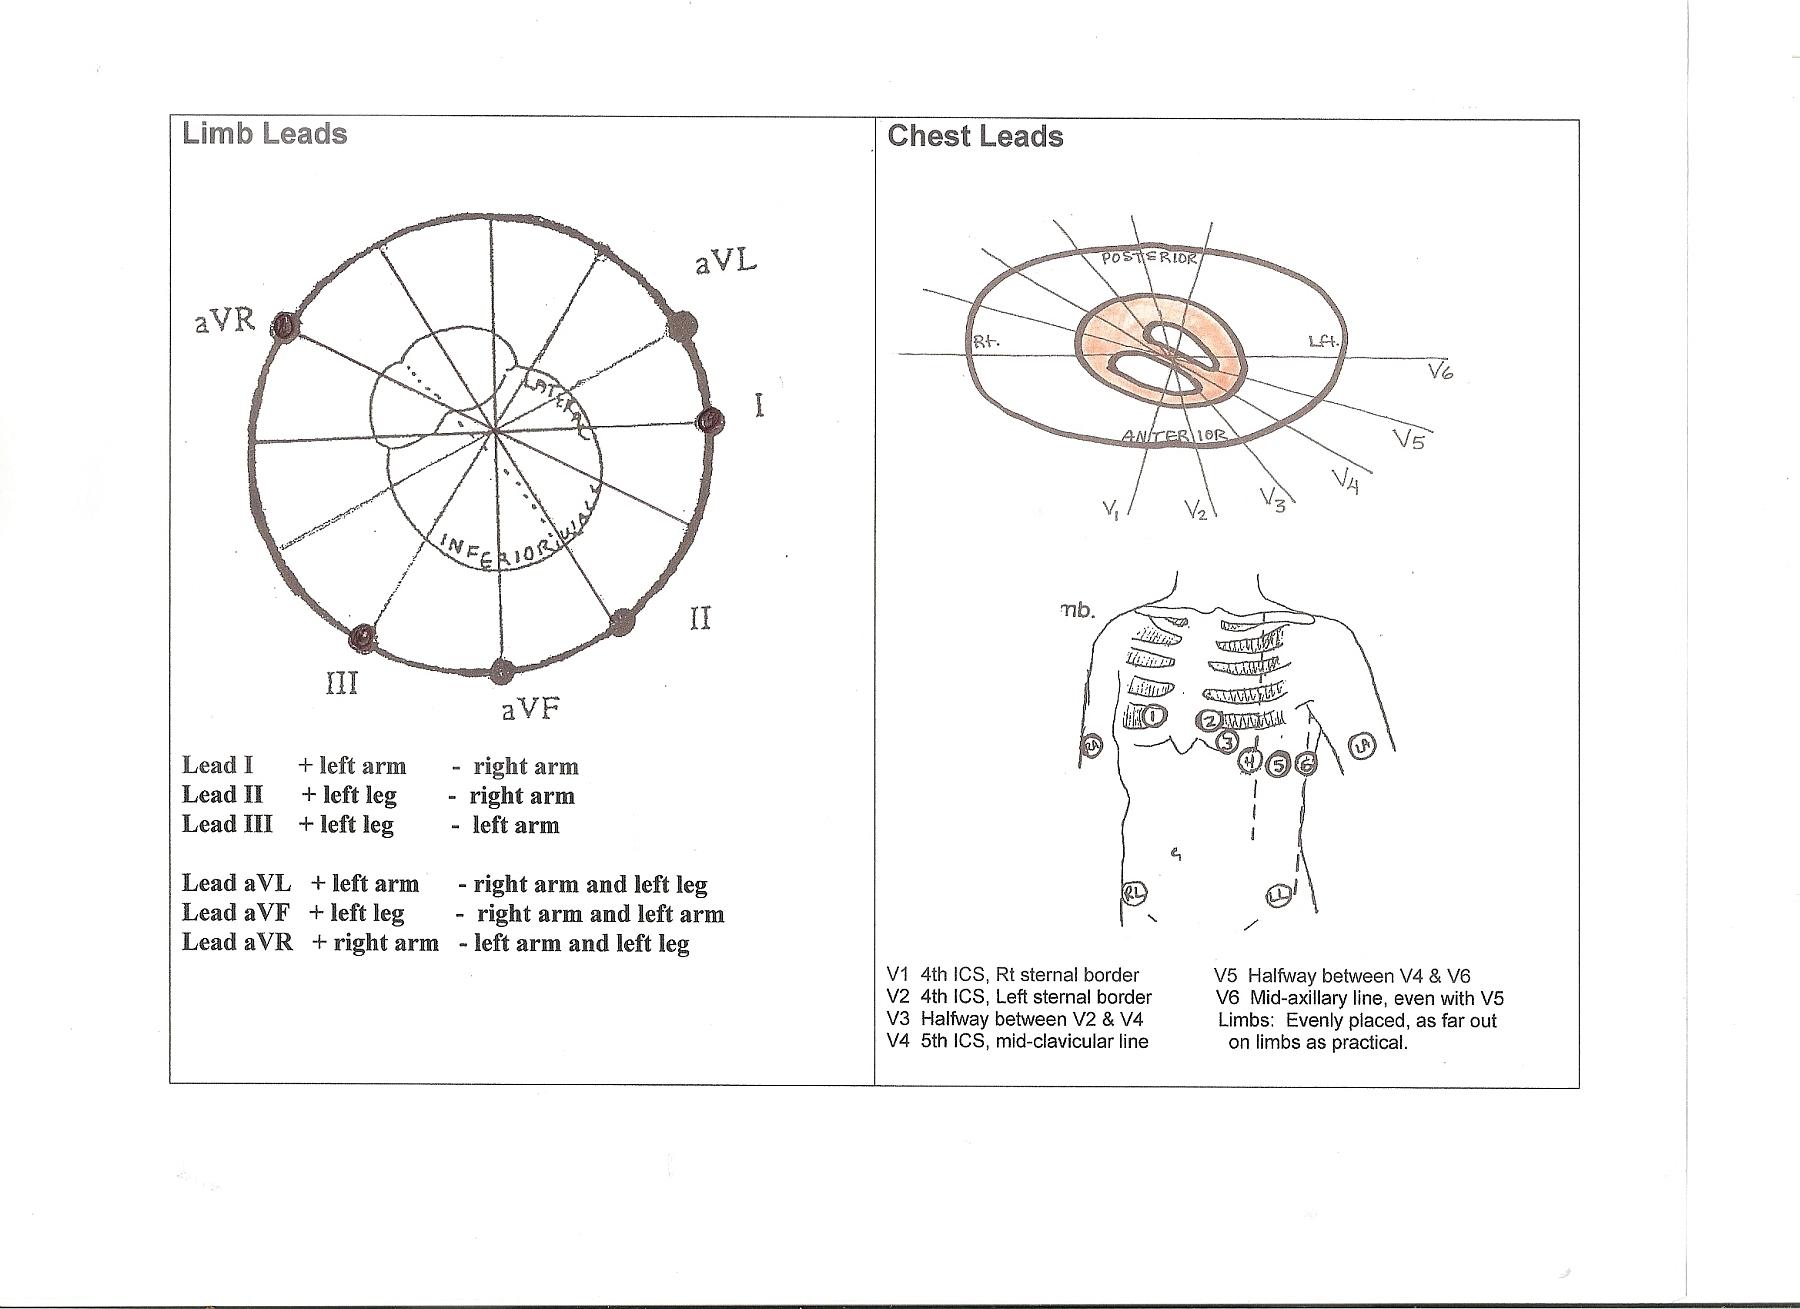 diagram of frontal  u0026 horizontal plane leads